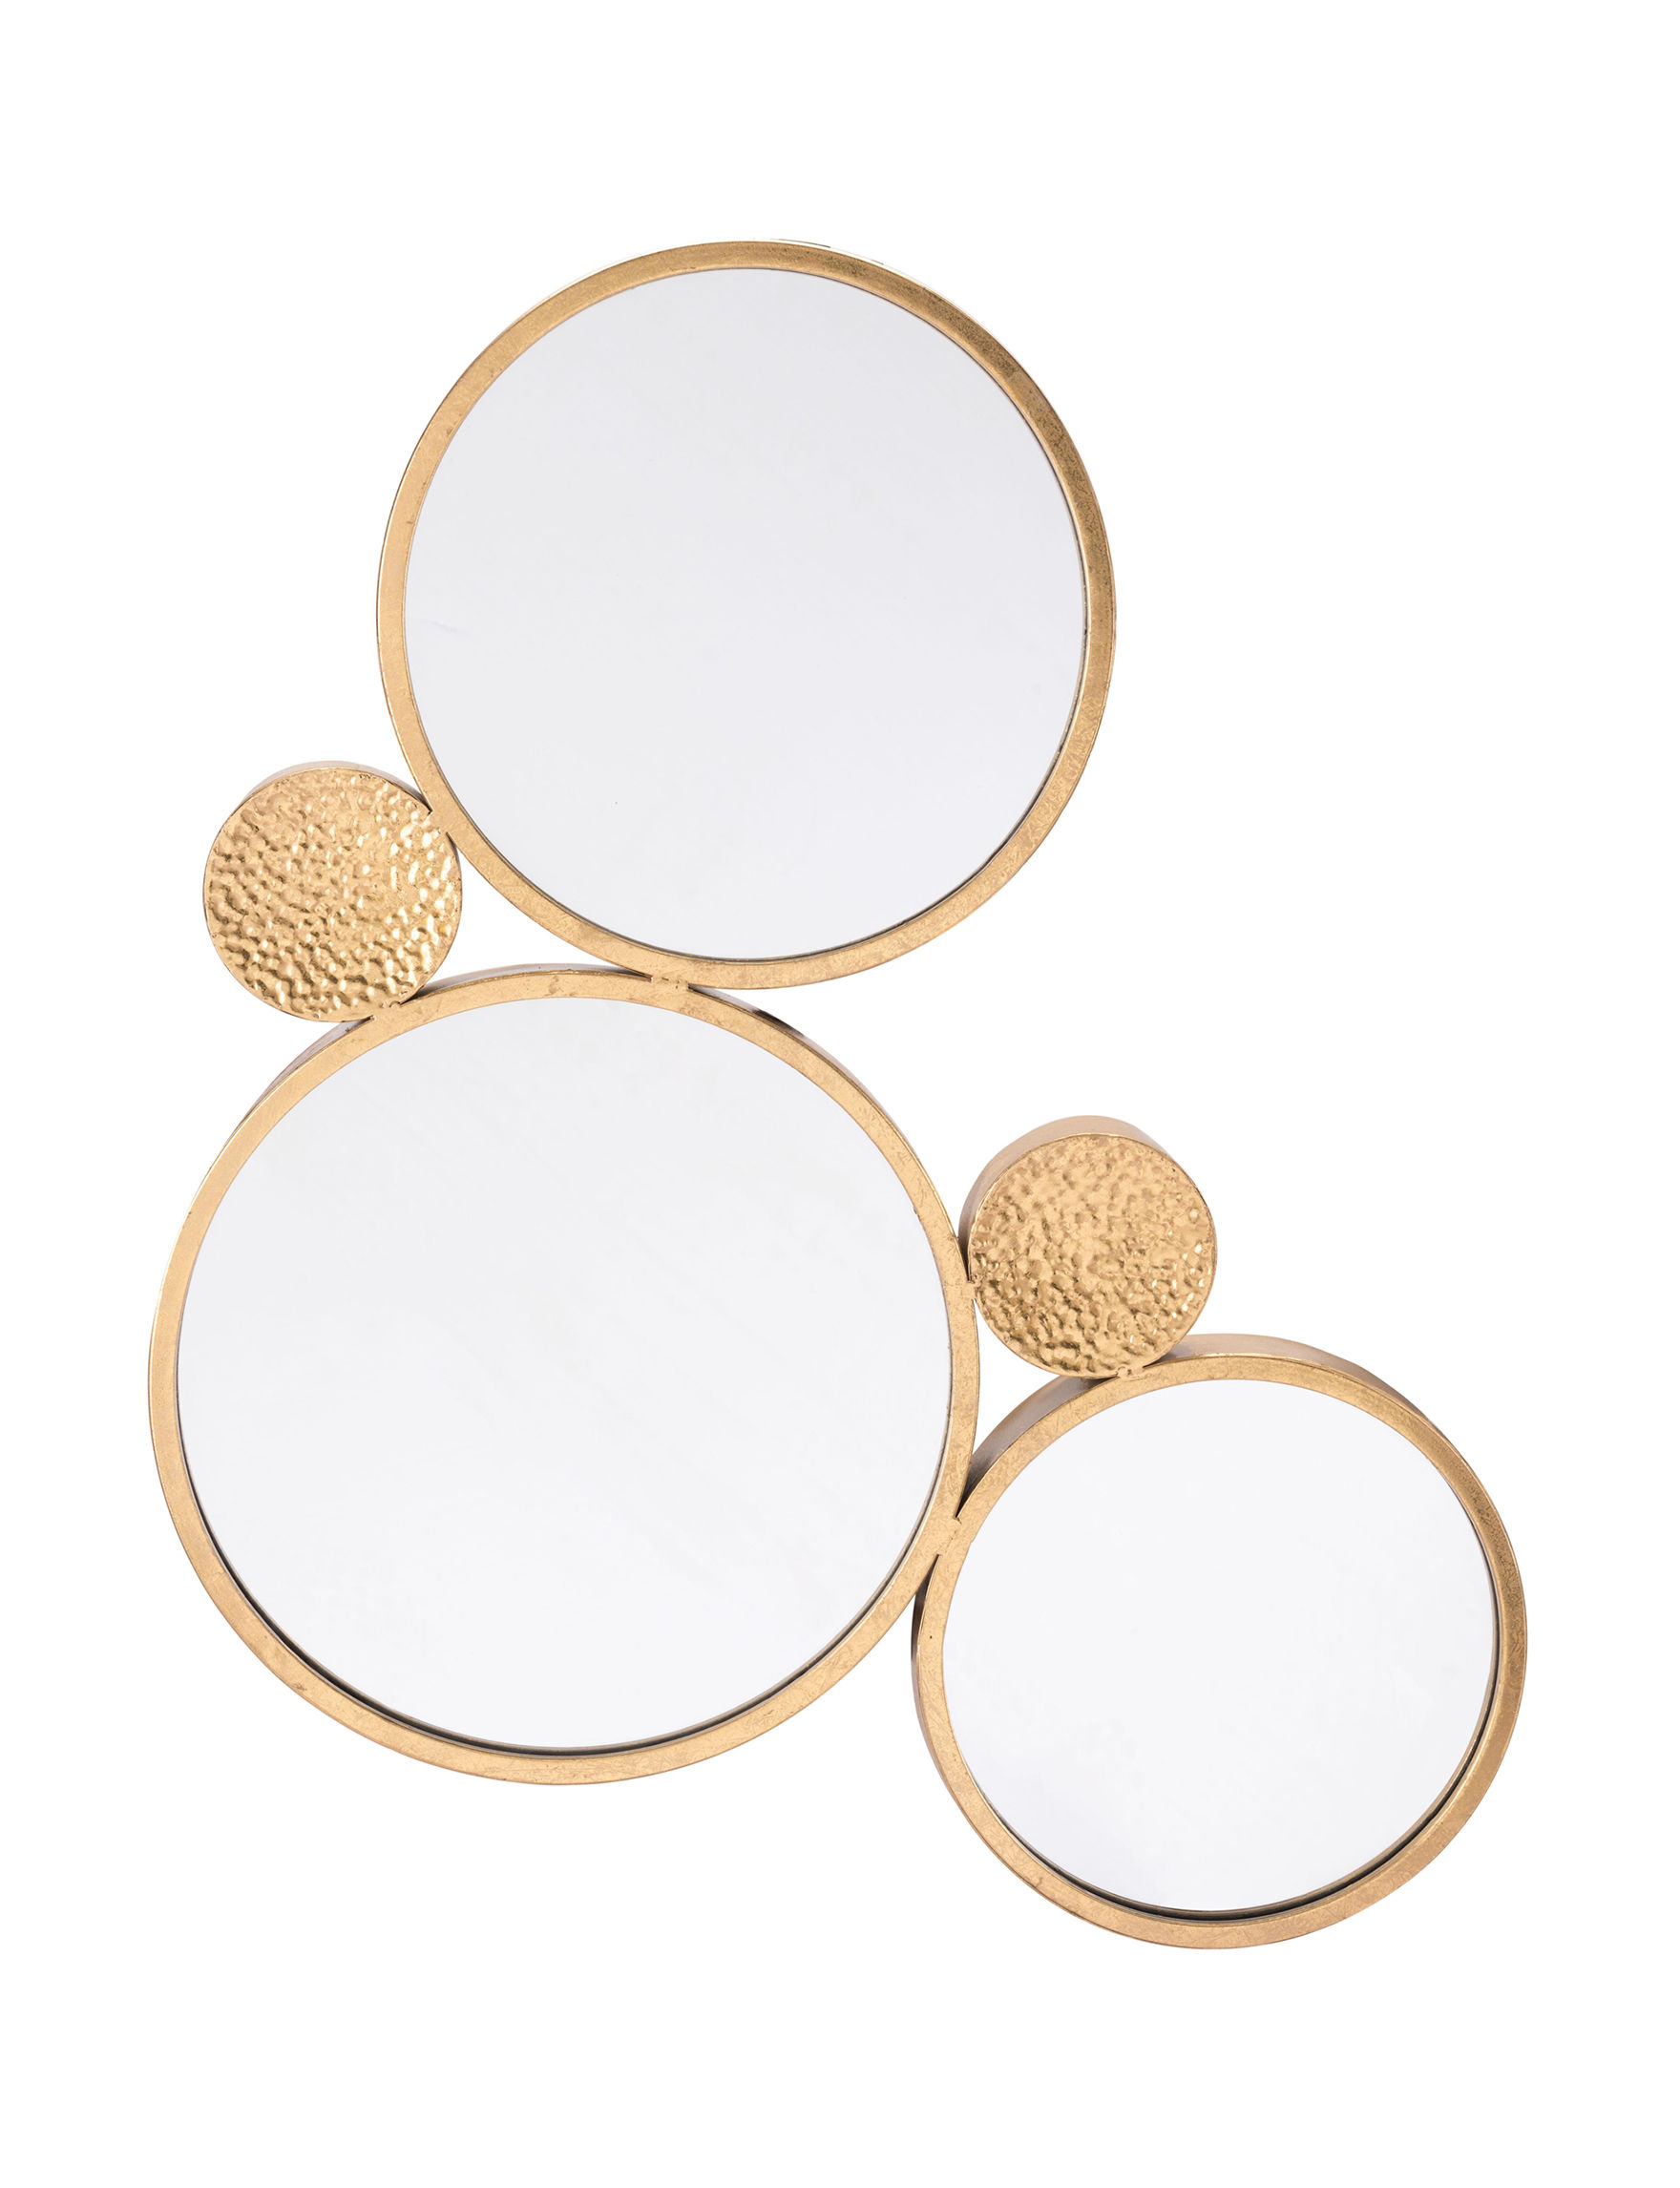 Zuo Modern Gold Mirrors Wall Decor